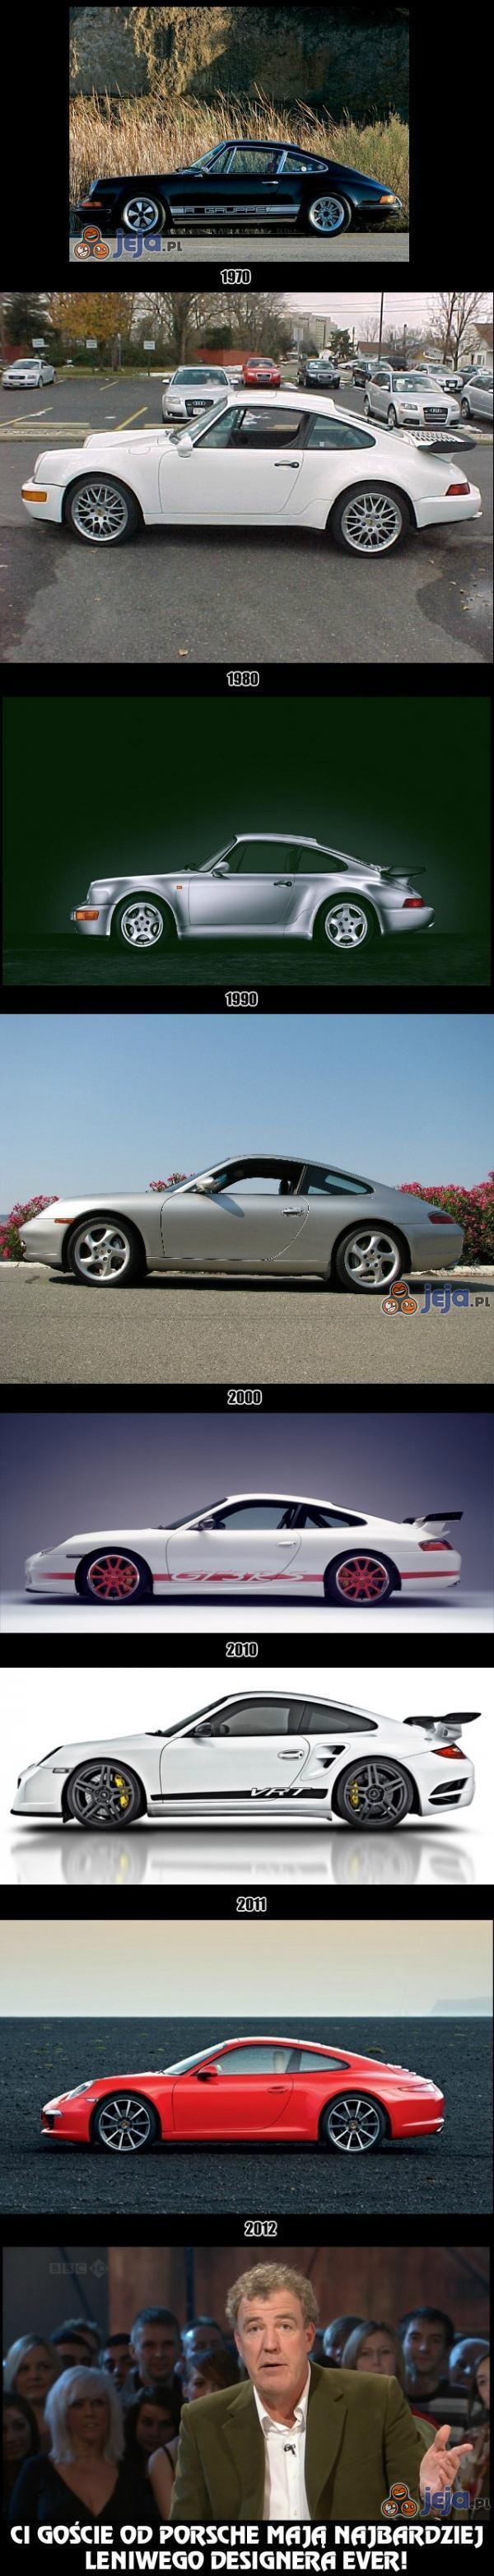 Porsche na przestrzeni lat